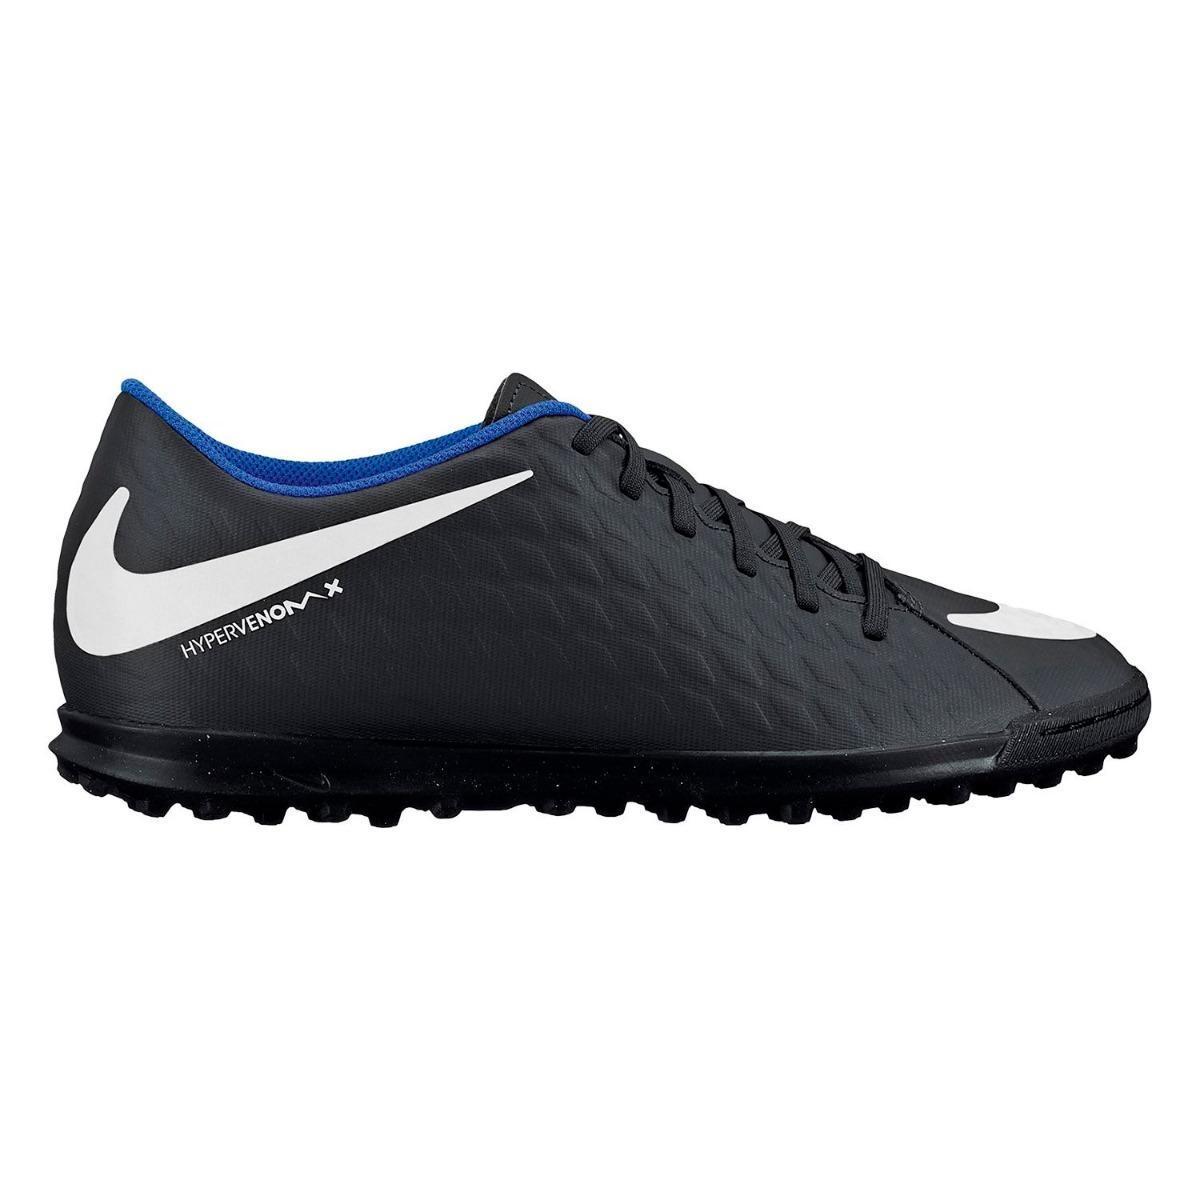 super popular 86754 0a8ad best price zapatillas nike mercurial para grass cc57a 3b57a best price zapatillas  nike hypervenom phade 3 tf para grass sintetico. cargando zoom. 4861c